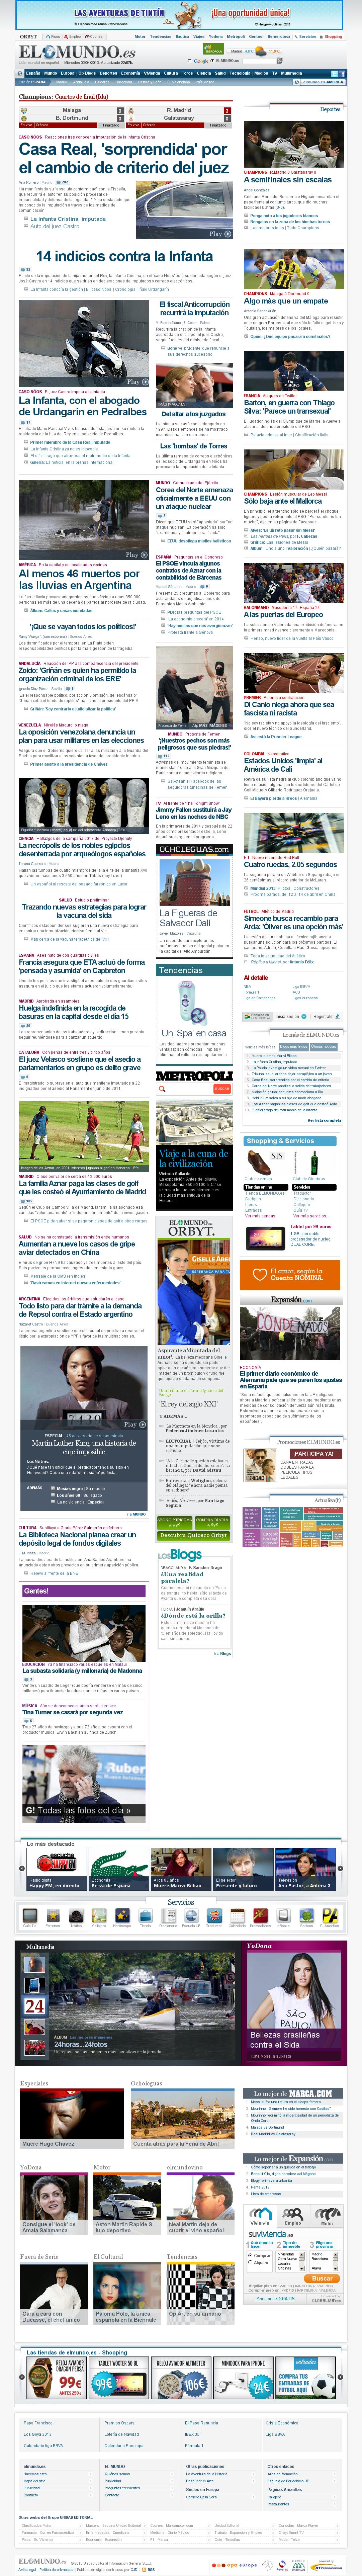 El Mundo at Wednesday April 3, 2013, 9:12 p.m. UTC